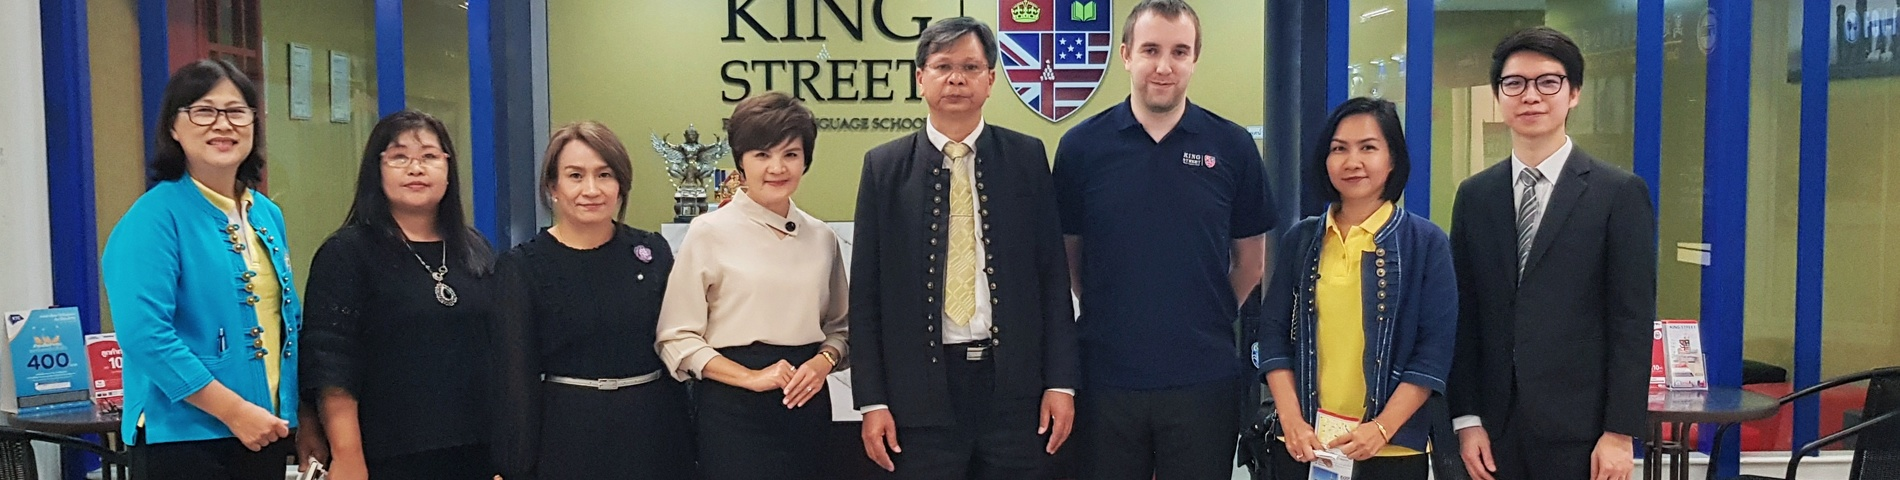 King Street English Language School kép 1